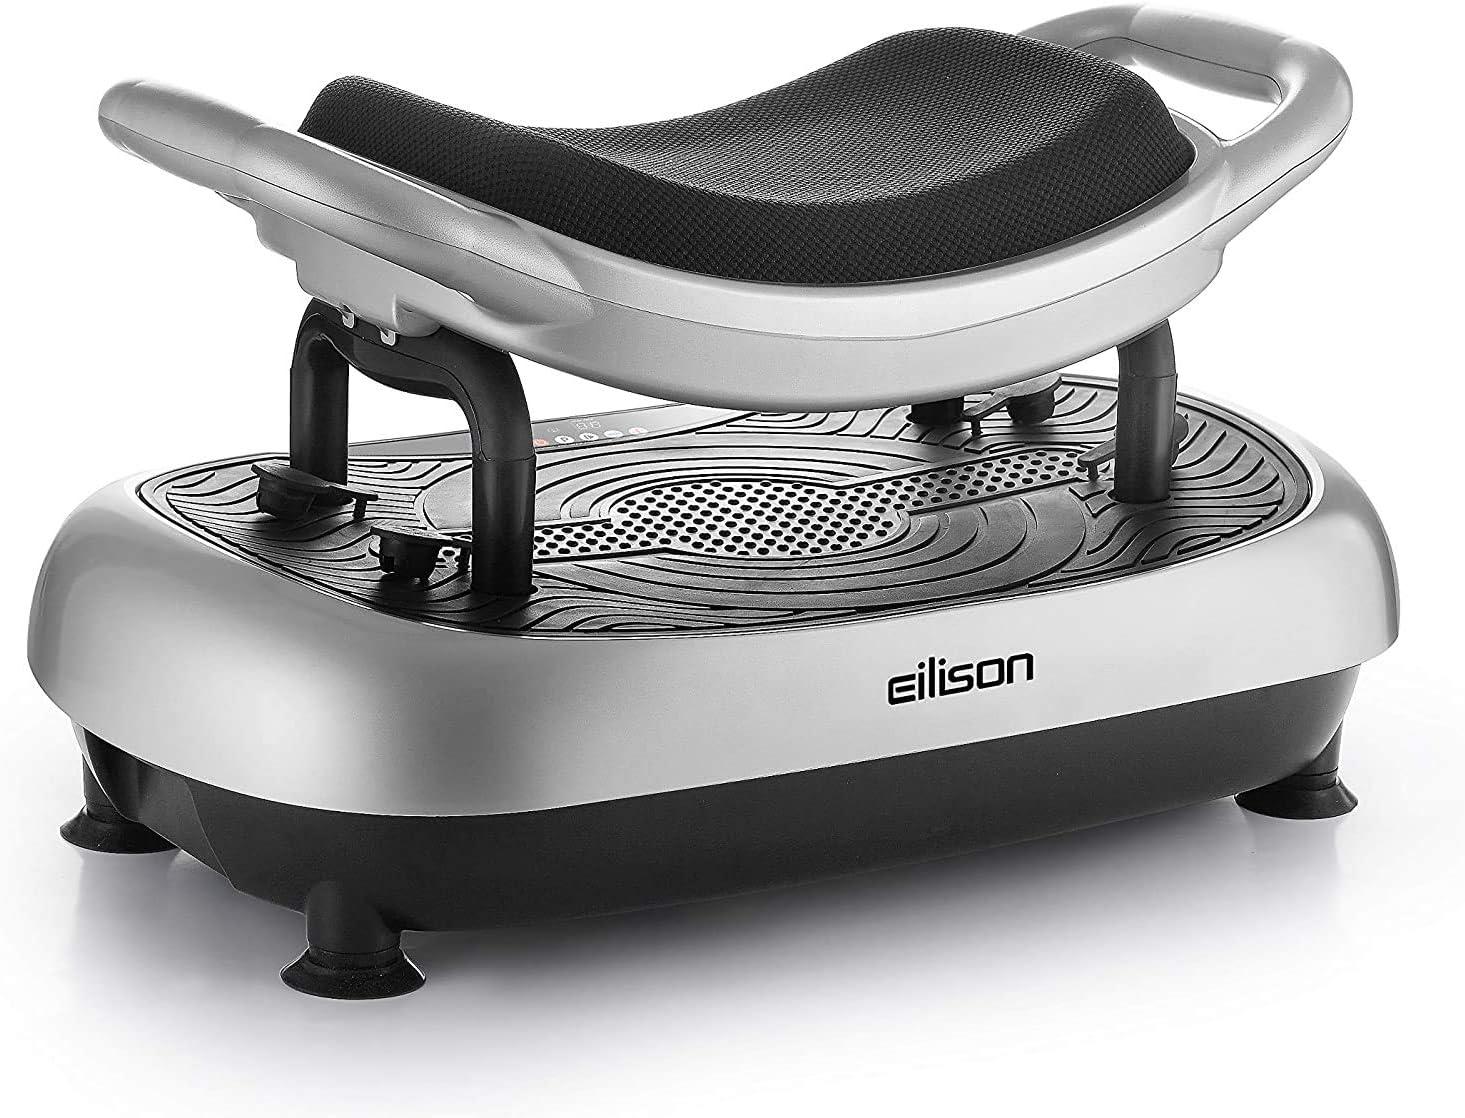 EILISON FITABS Vibration Genuine Plate Exercise Plat trust Machine -